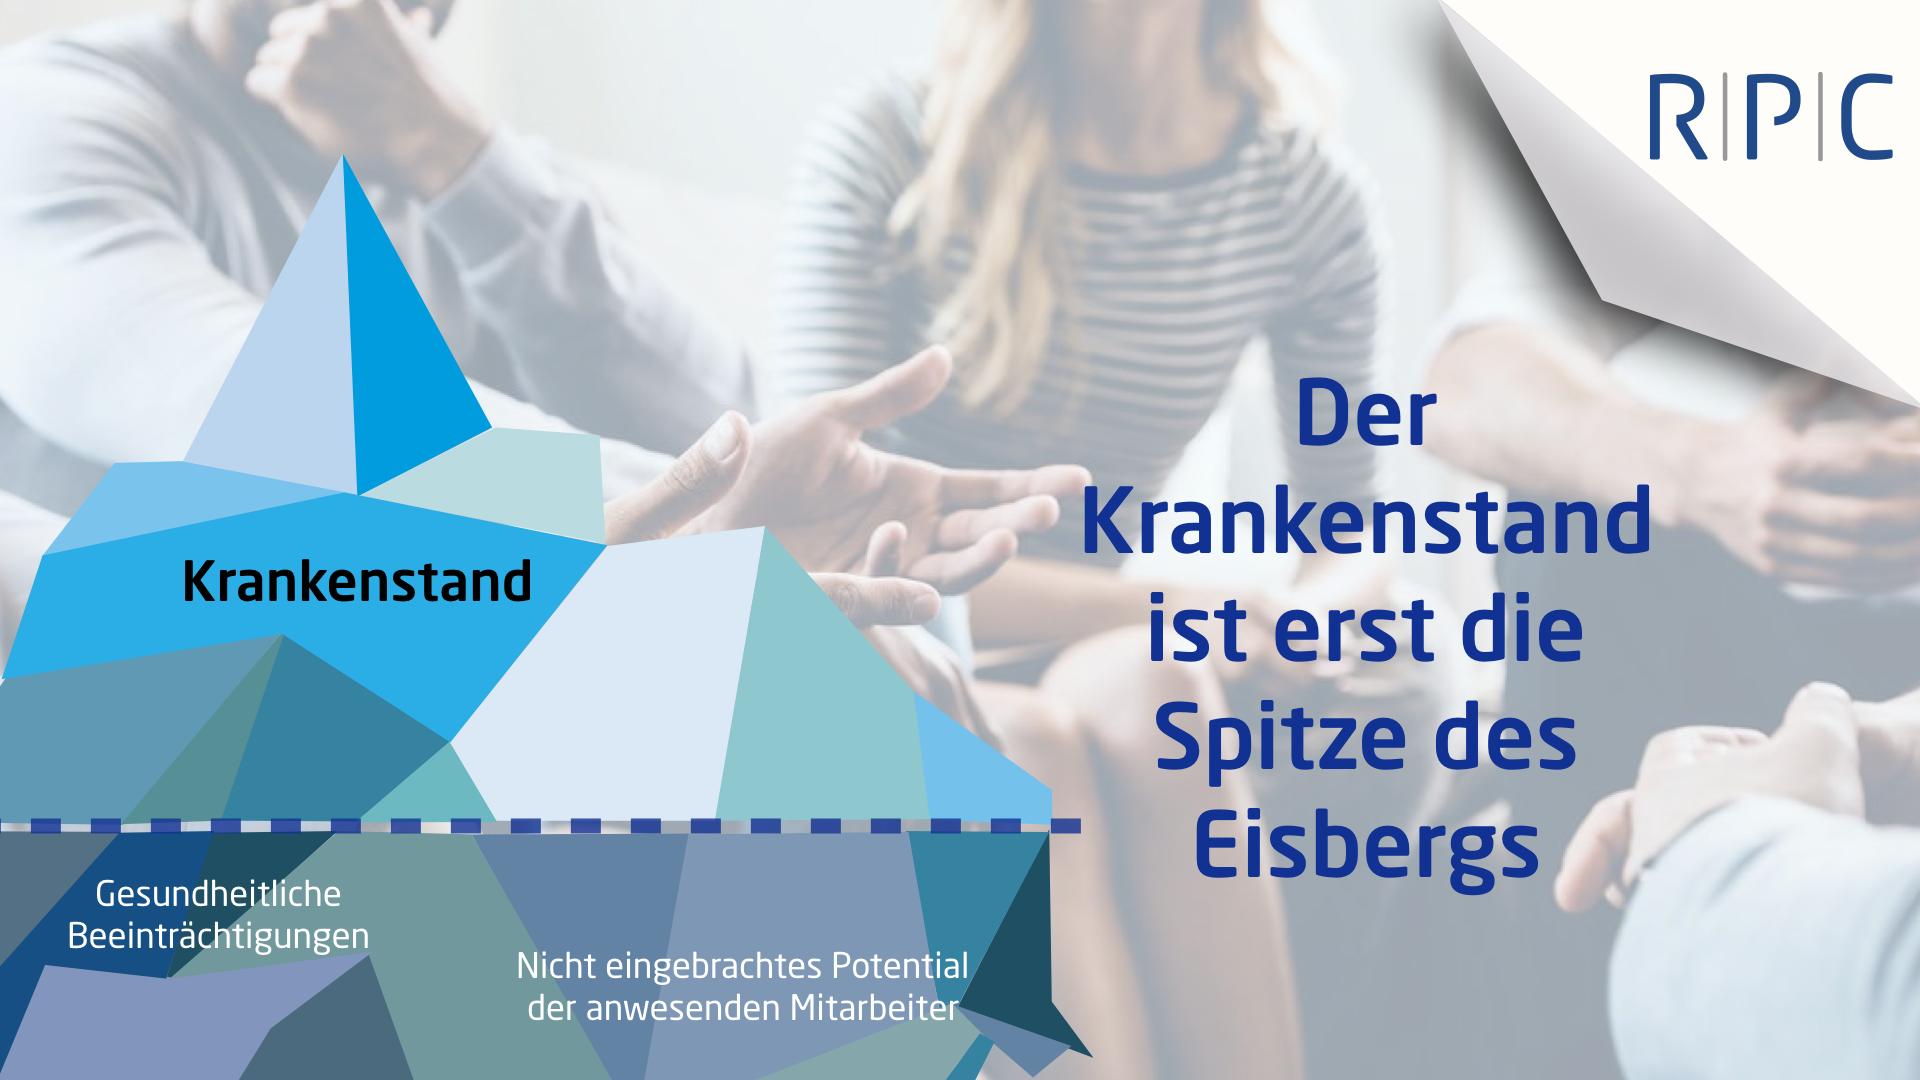 RPC Consulting GmbH Krankenstand Präsentismus Absentismzs